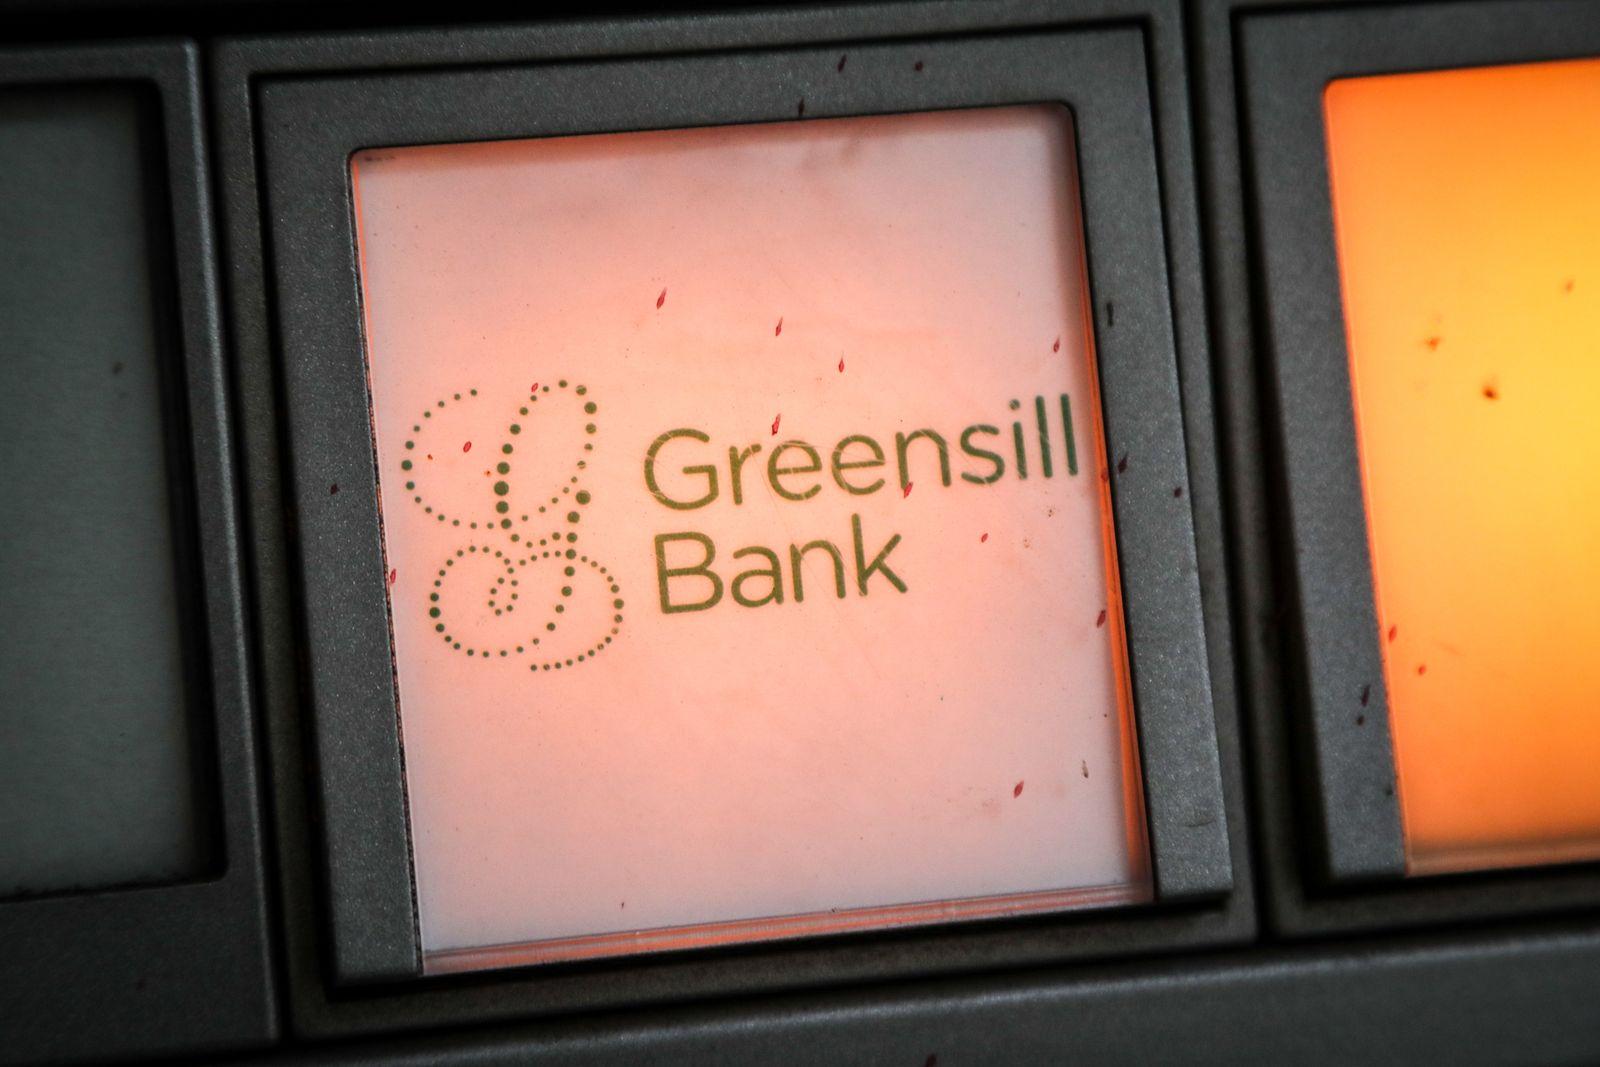 German finance authorities intervene at Greensill Bank